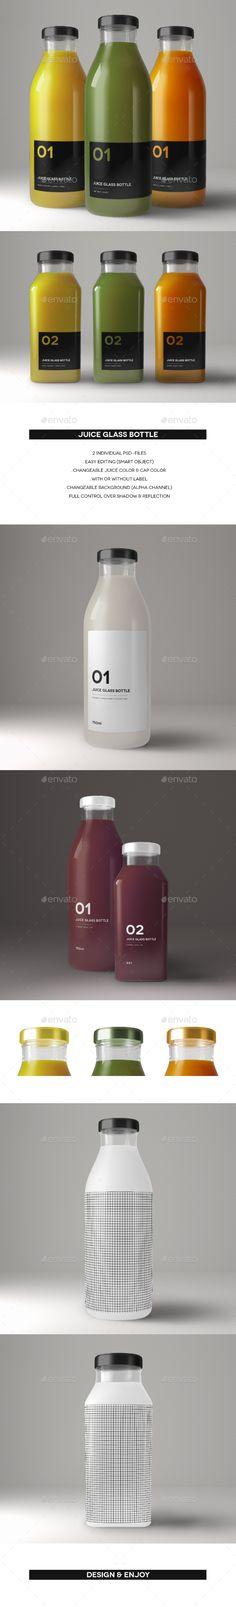 Juice Glass Bottle MockUp. Download here: http://graphicriver.net/item/juice-glass-bottle/16121883?ref=ksioks